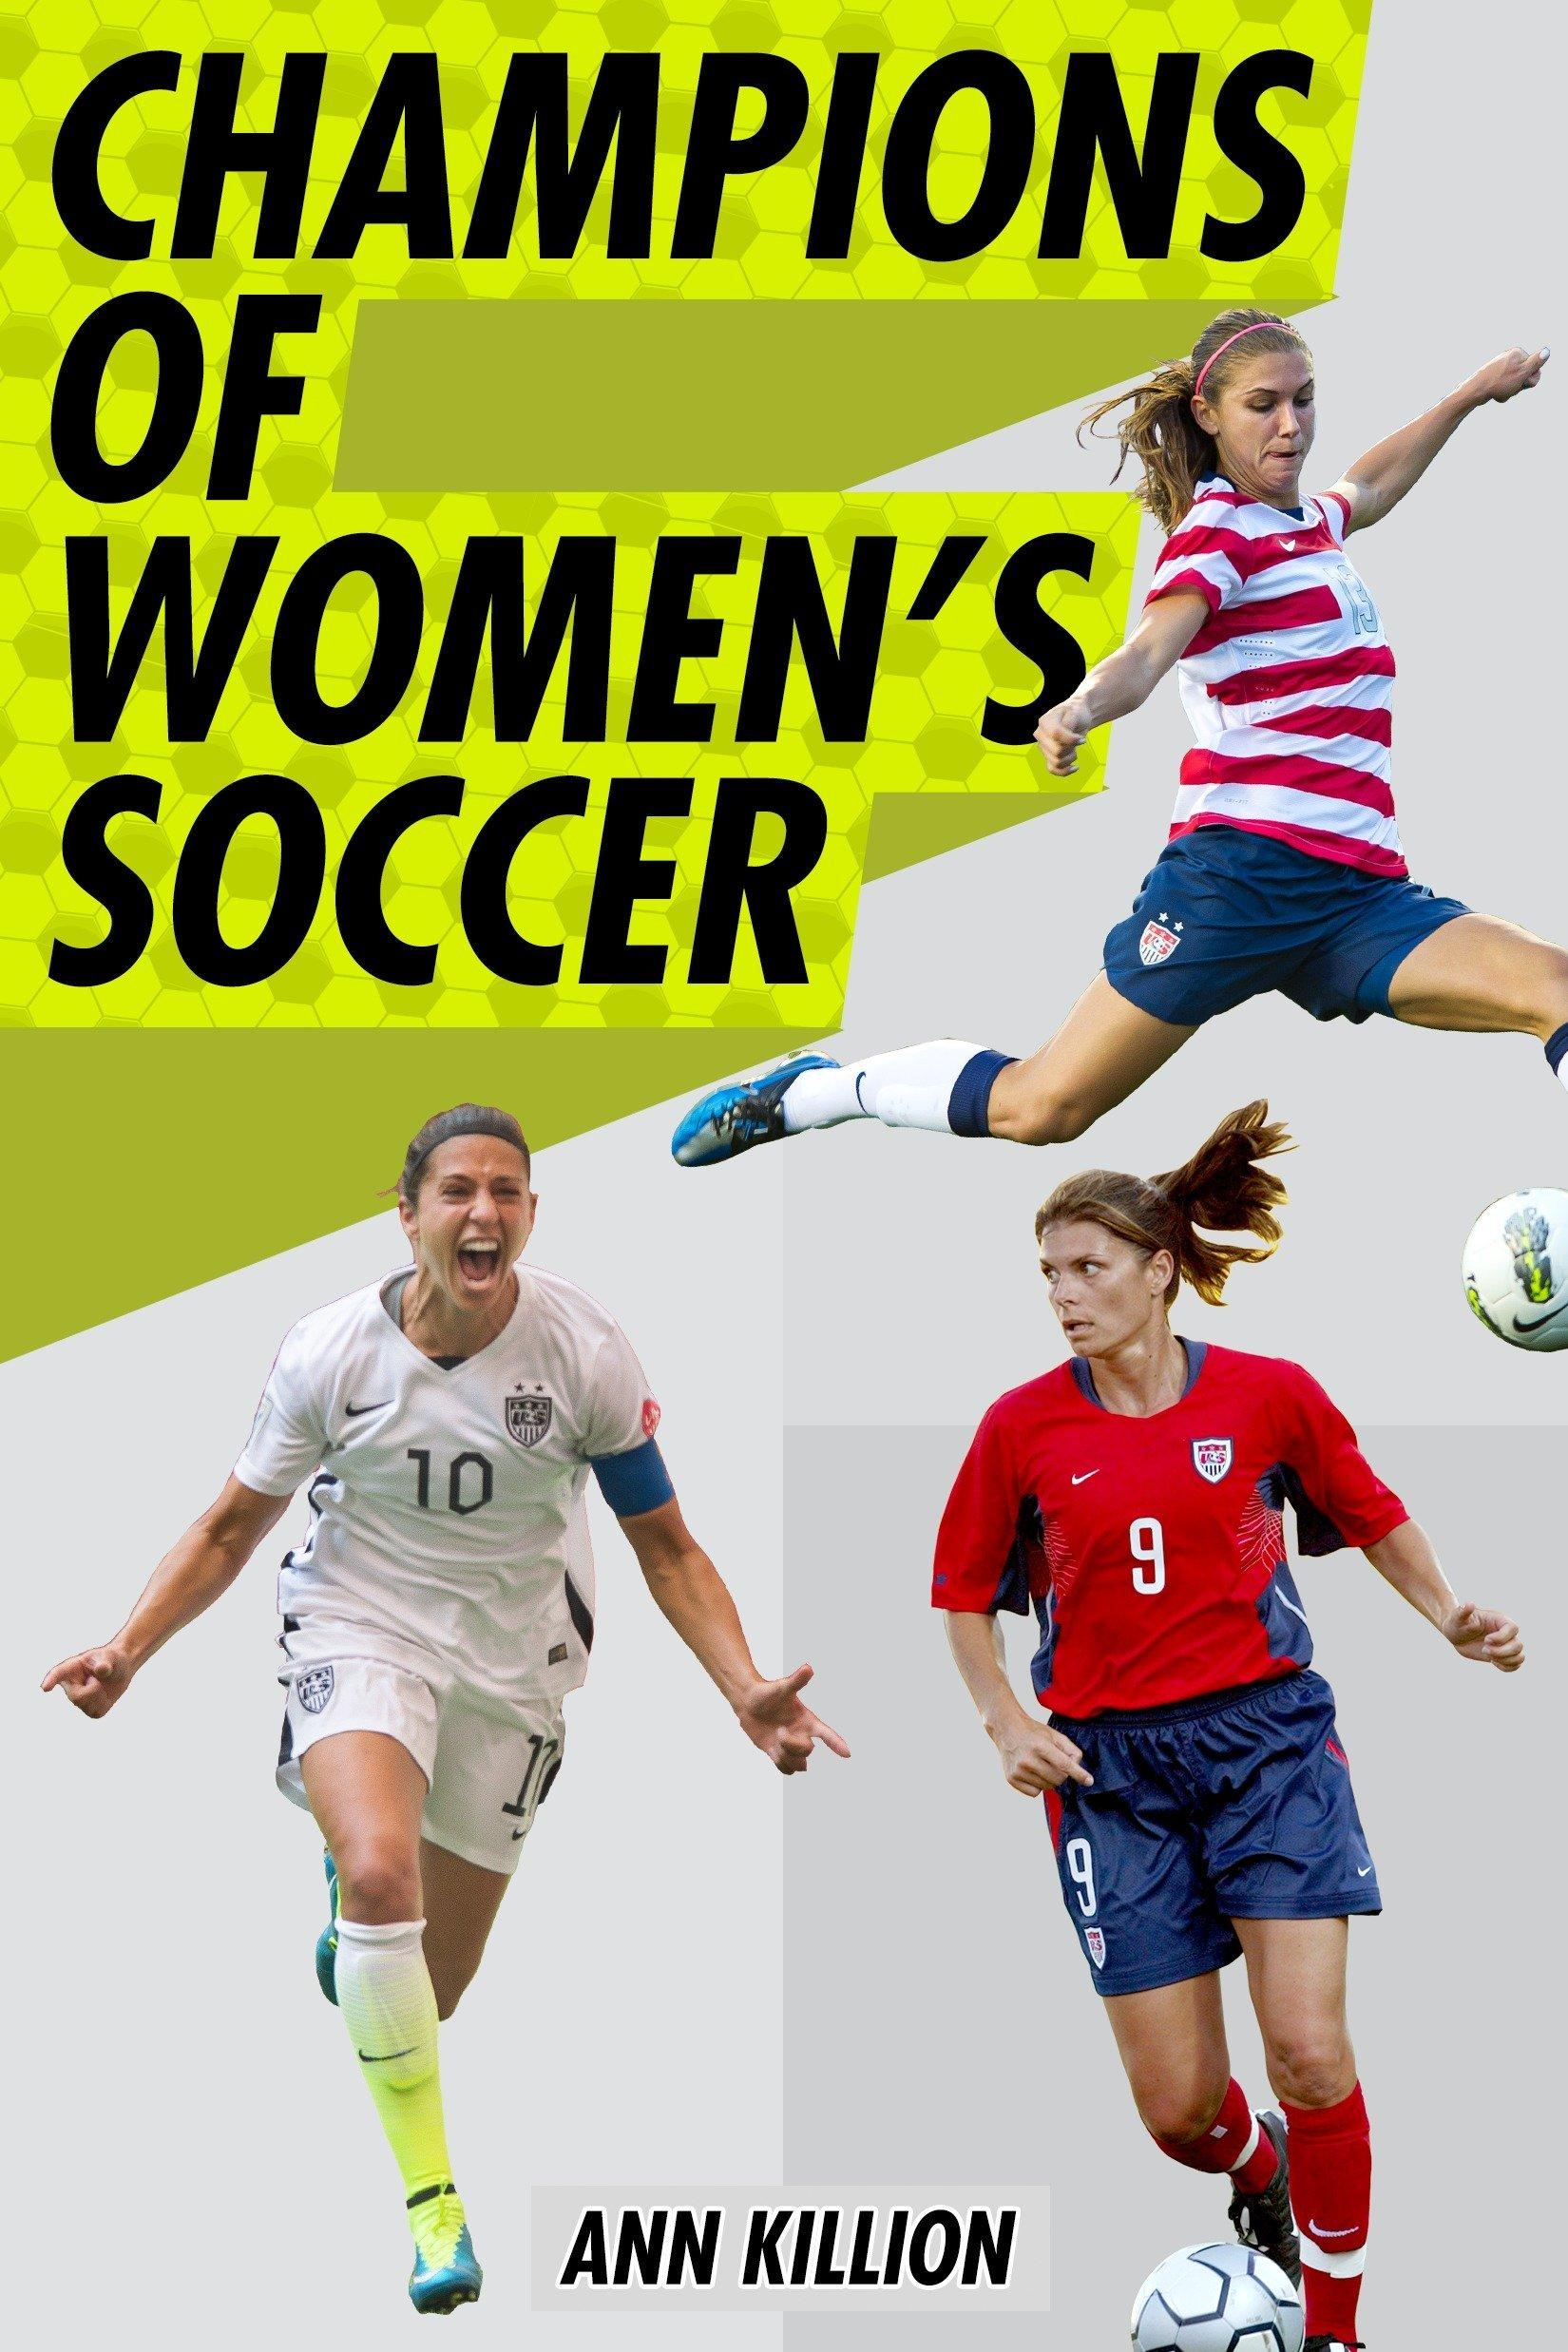 Champions of Women's Soccer